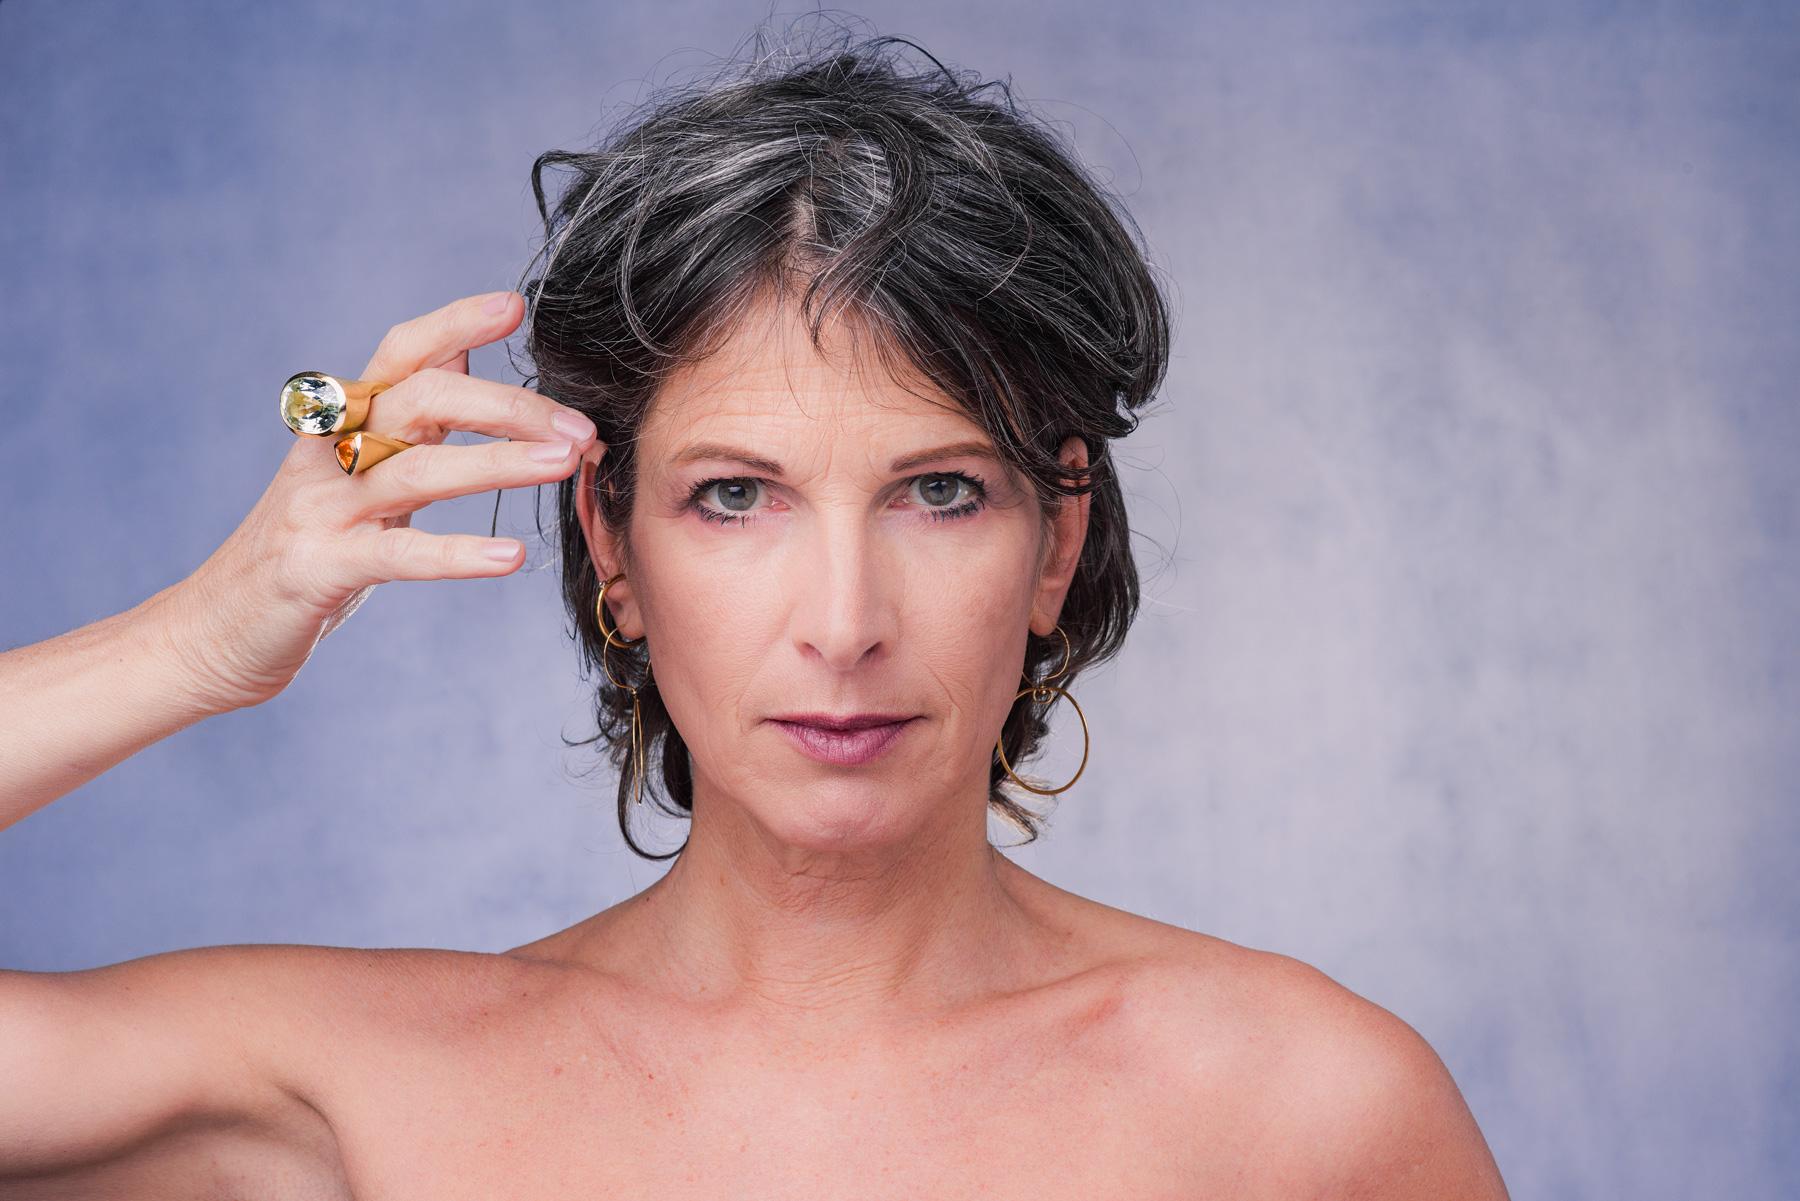 Nicola Beller Carbone